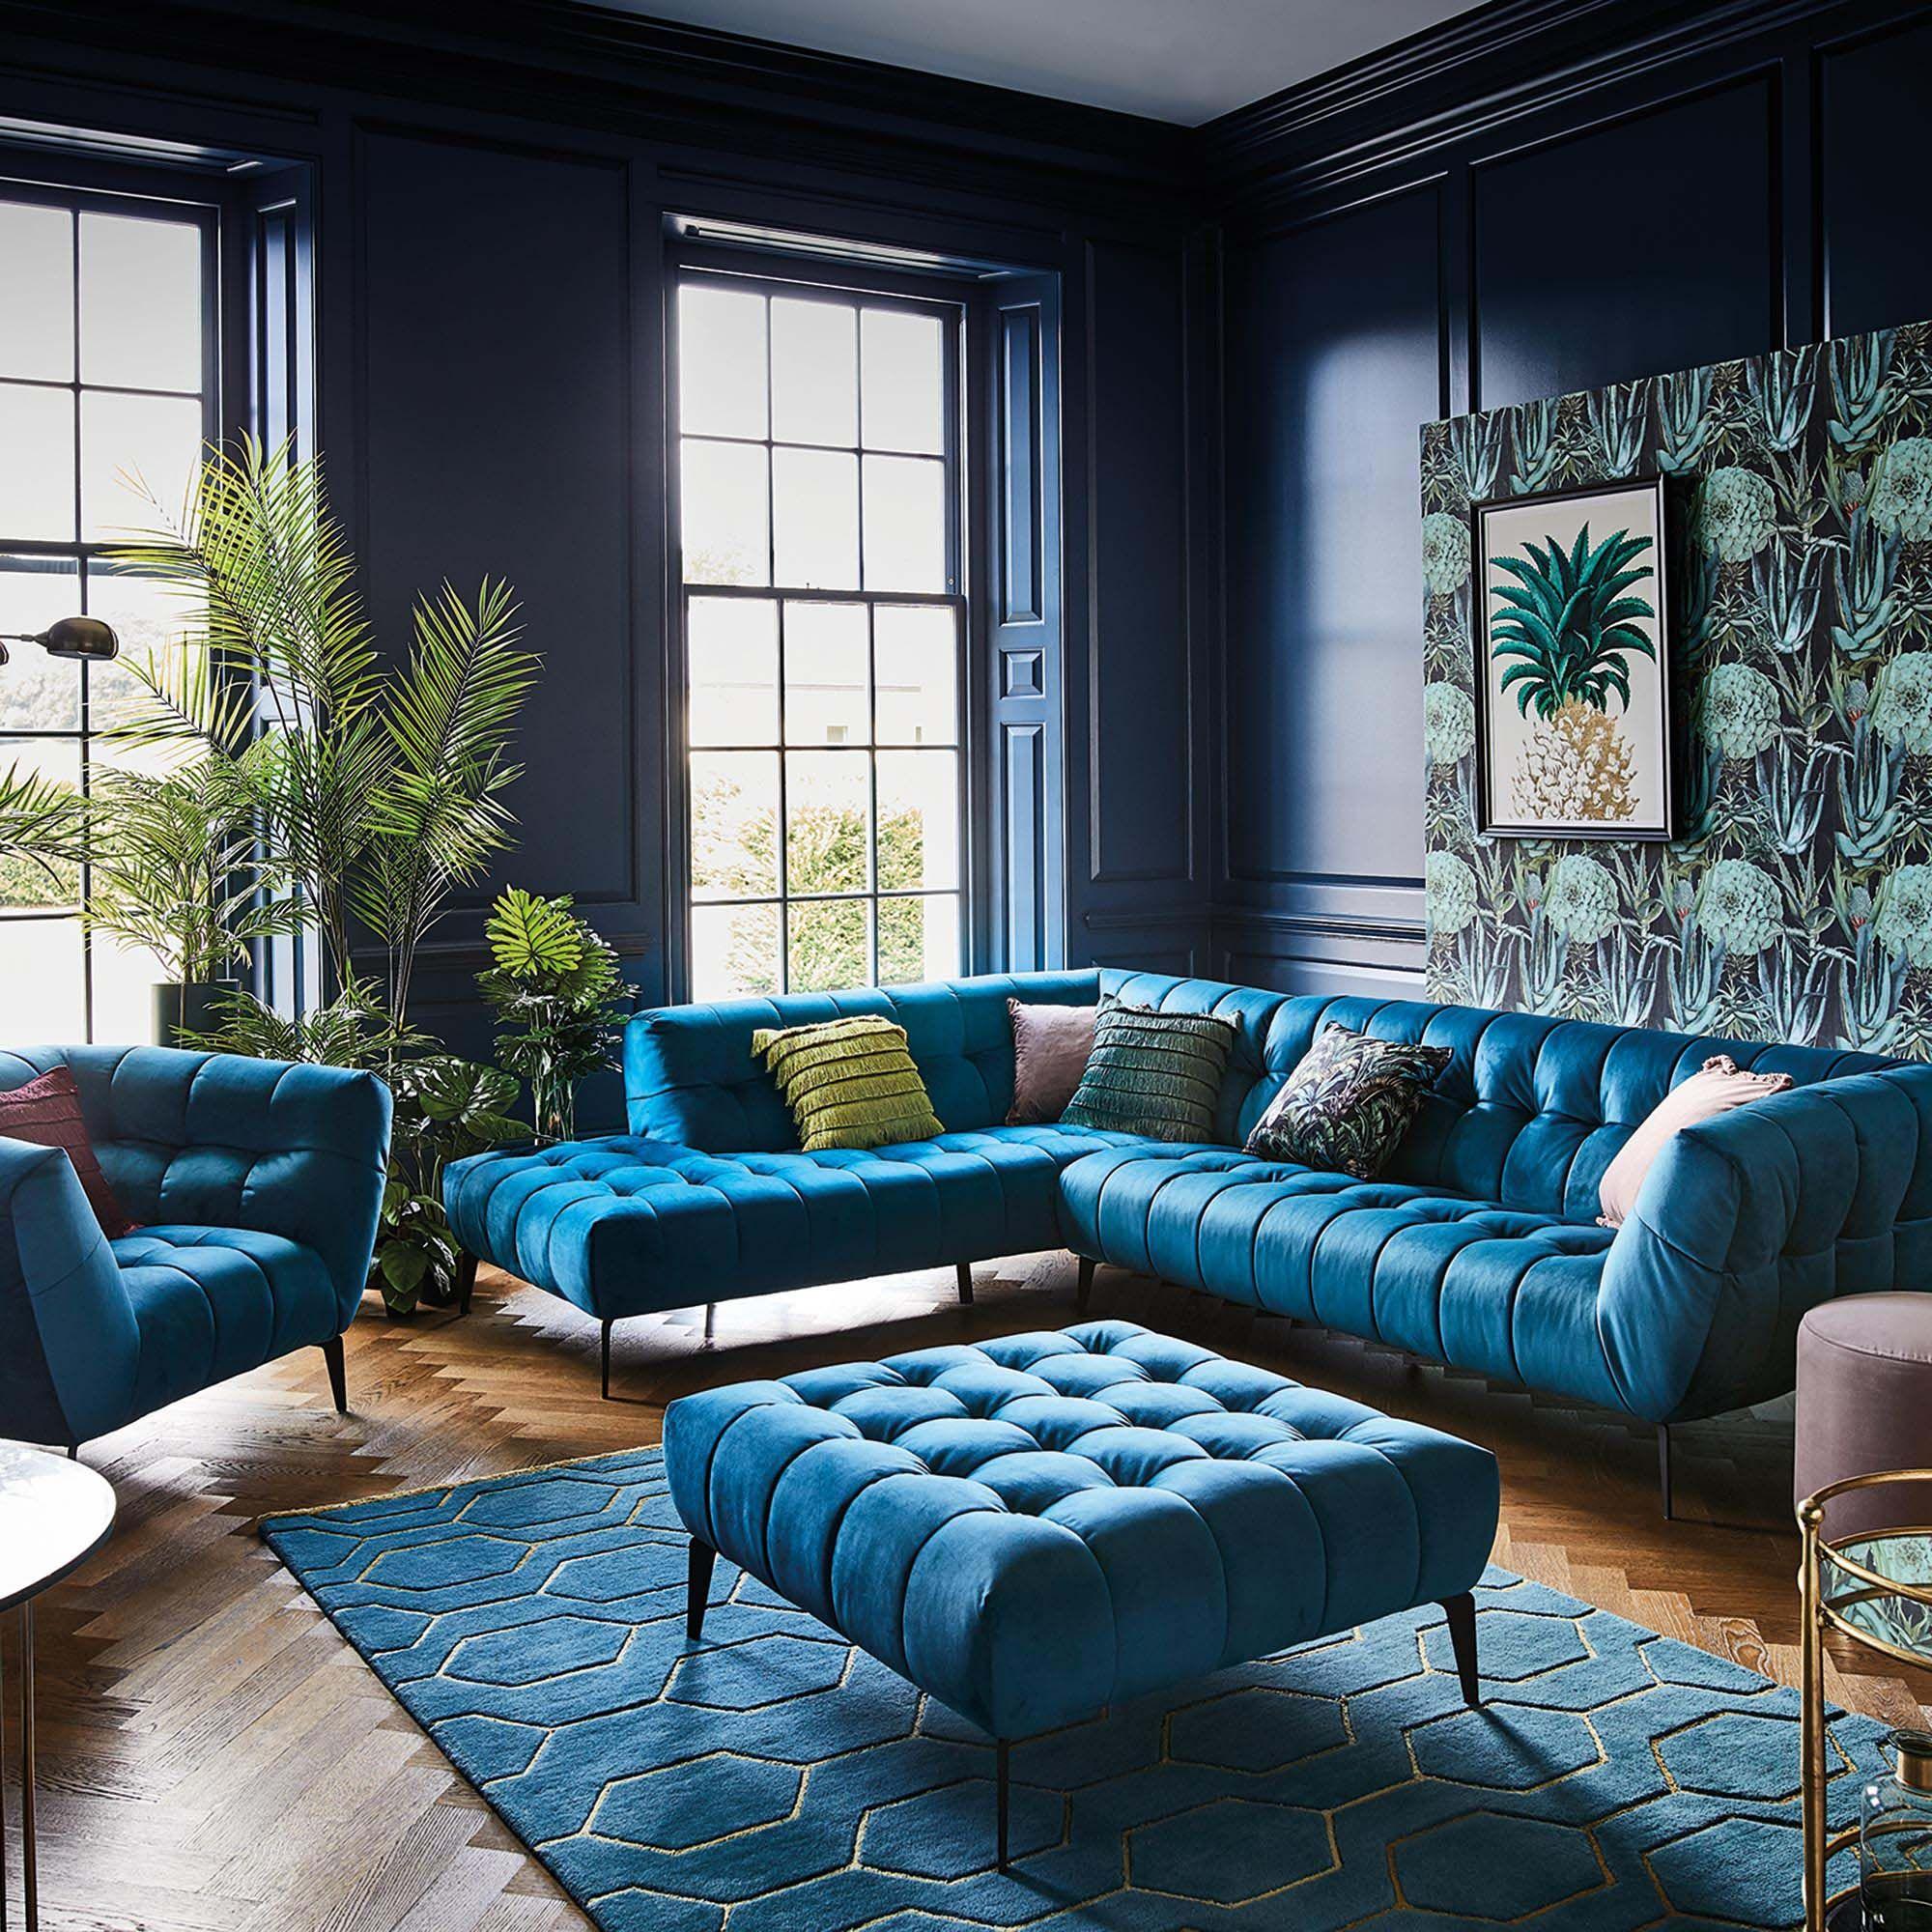 Pin By She She On She She Vol 2 Living Room Sofa Design